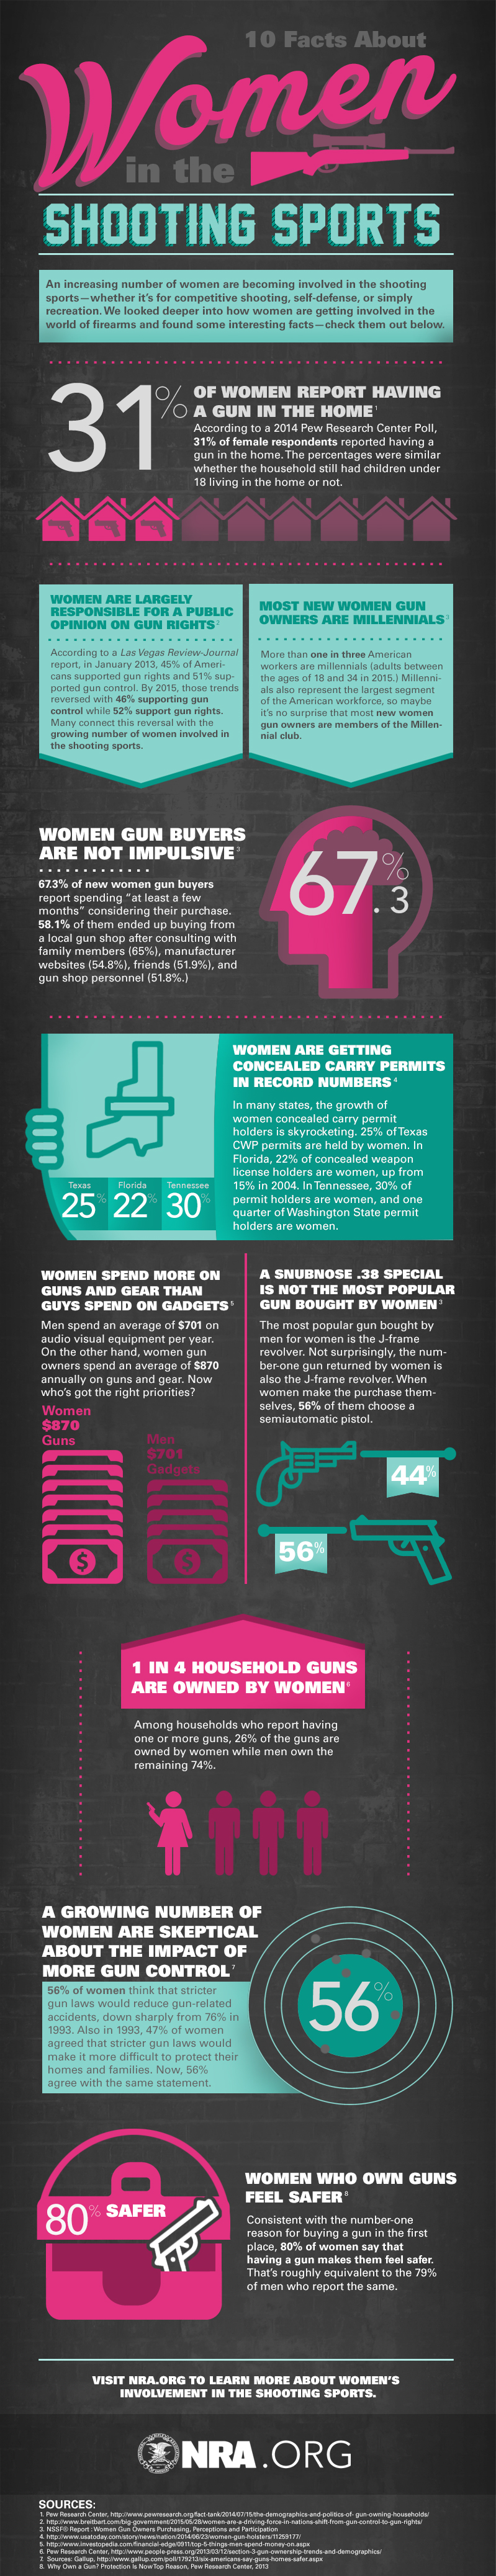 Women_in_ShootingSports (3)